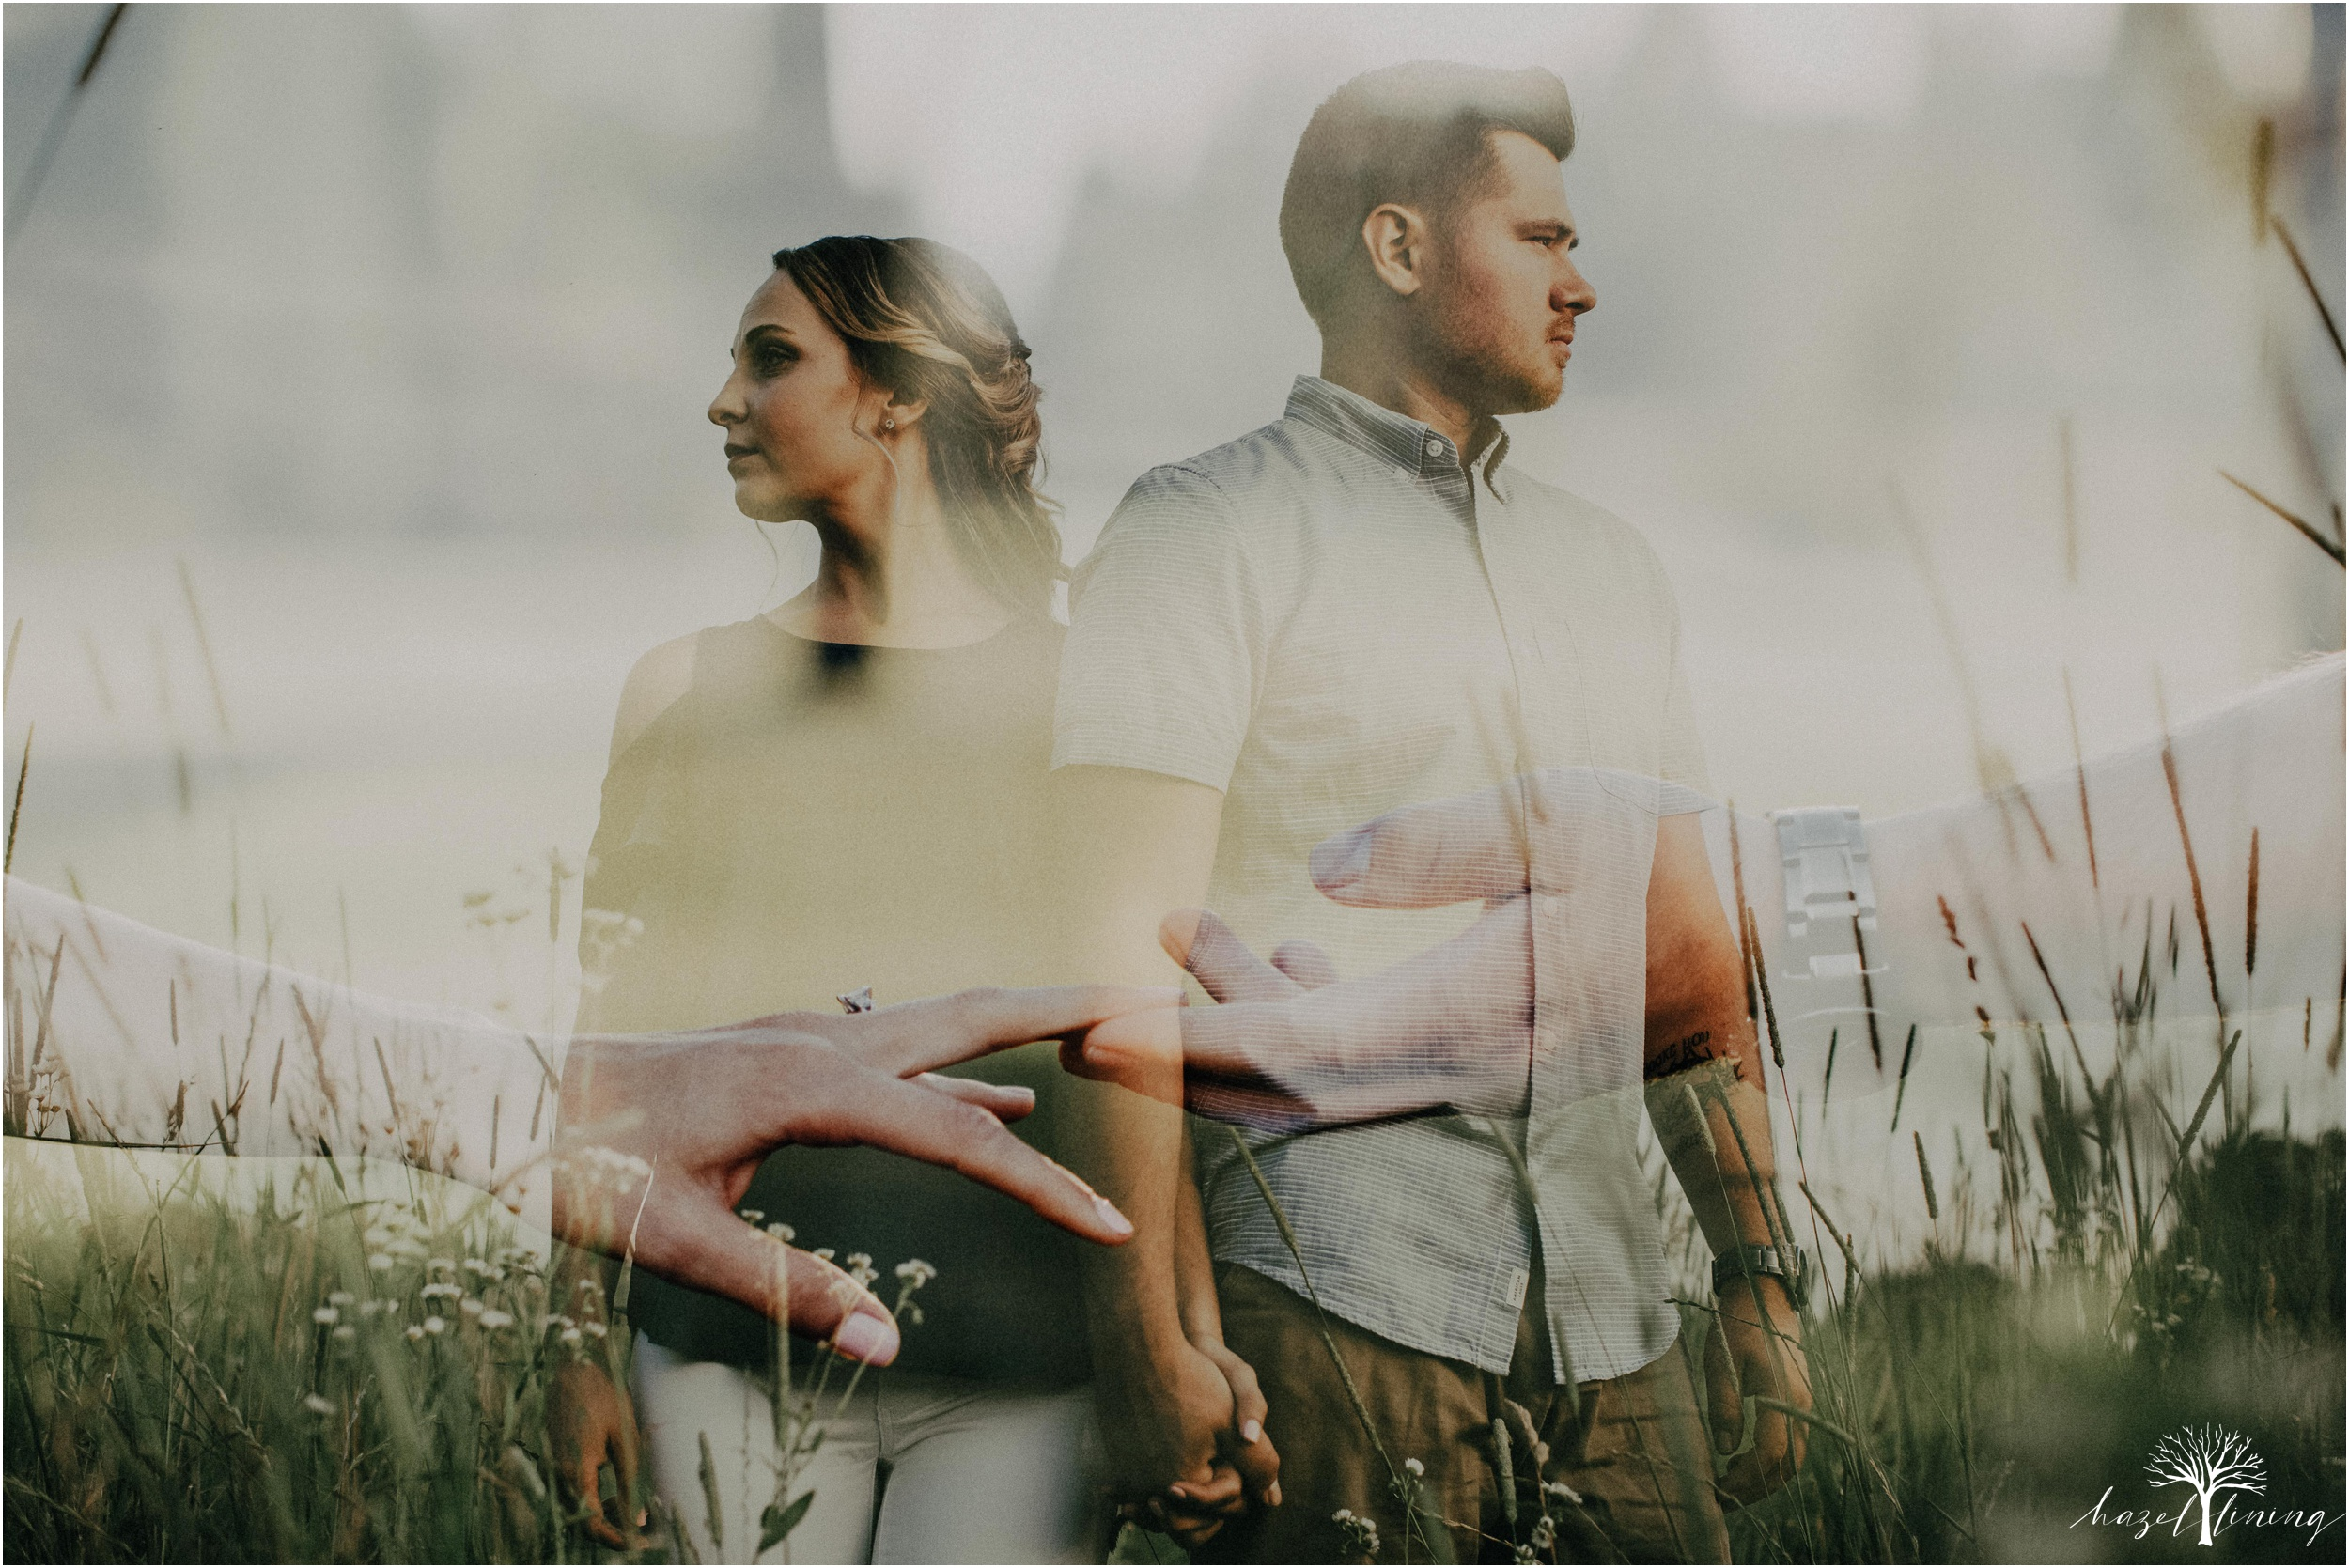 rachel-warner-chris-niedrist-the-farm-bakery-and-events-quakertown-pa-summer-engagement-hazel-lining-photography-destination-elopement-wedding-engagement-photography_0049.jpg